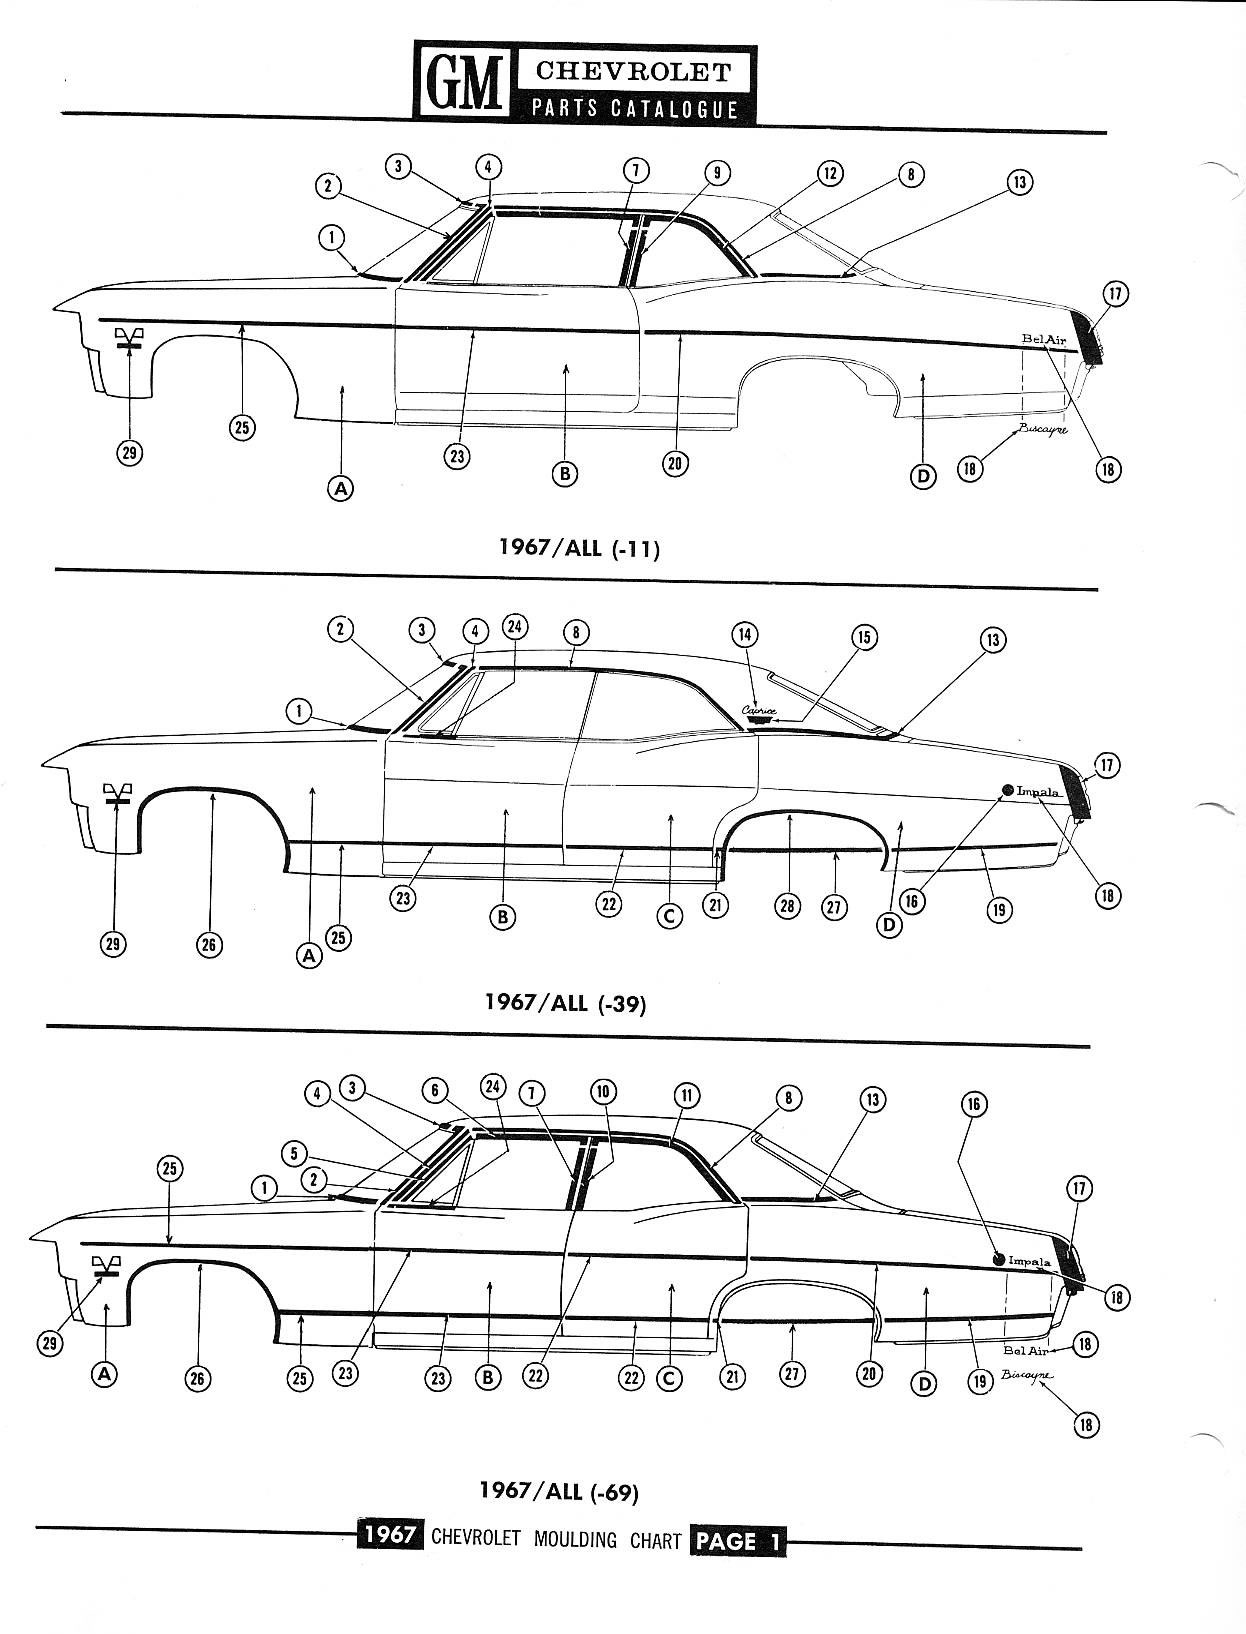 Vieira 1959 Impala Convertible 82 as well 1960accessoriespricesched Pg3 also 1958 Chevrolet Wiring Diagram likewise 1958 Biscayne Emblem further Chevroletindex. on 1958 chevrolet biscayne